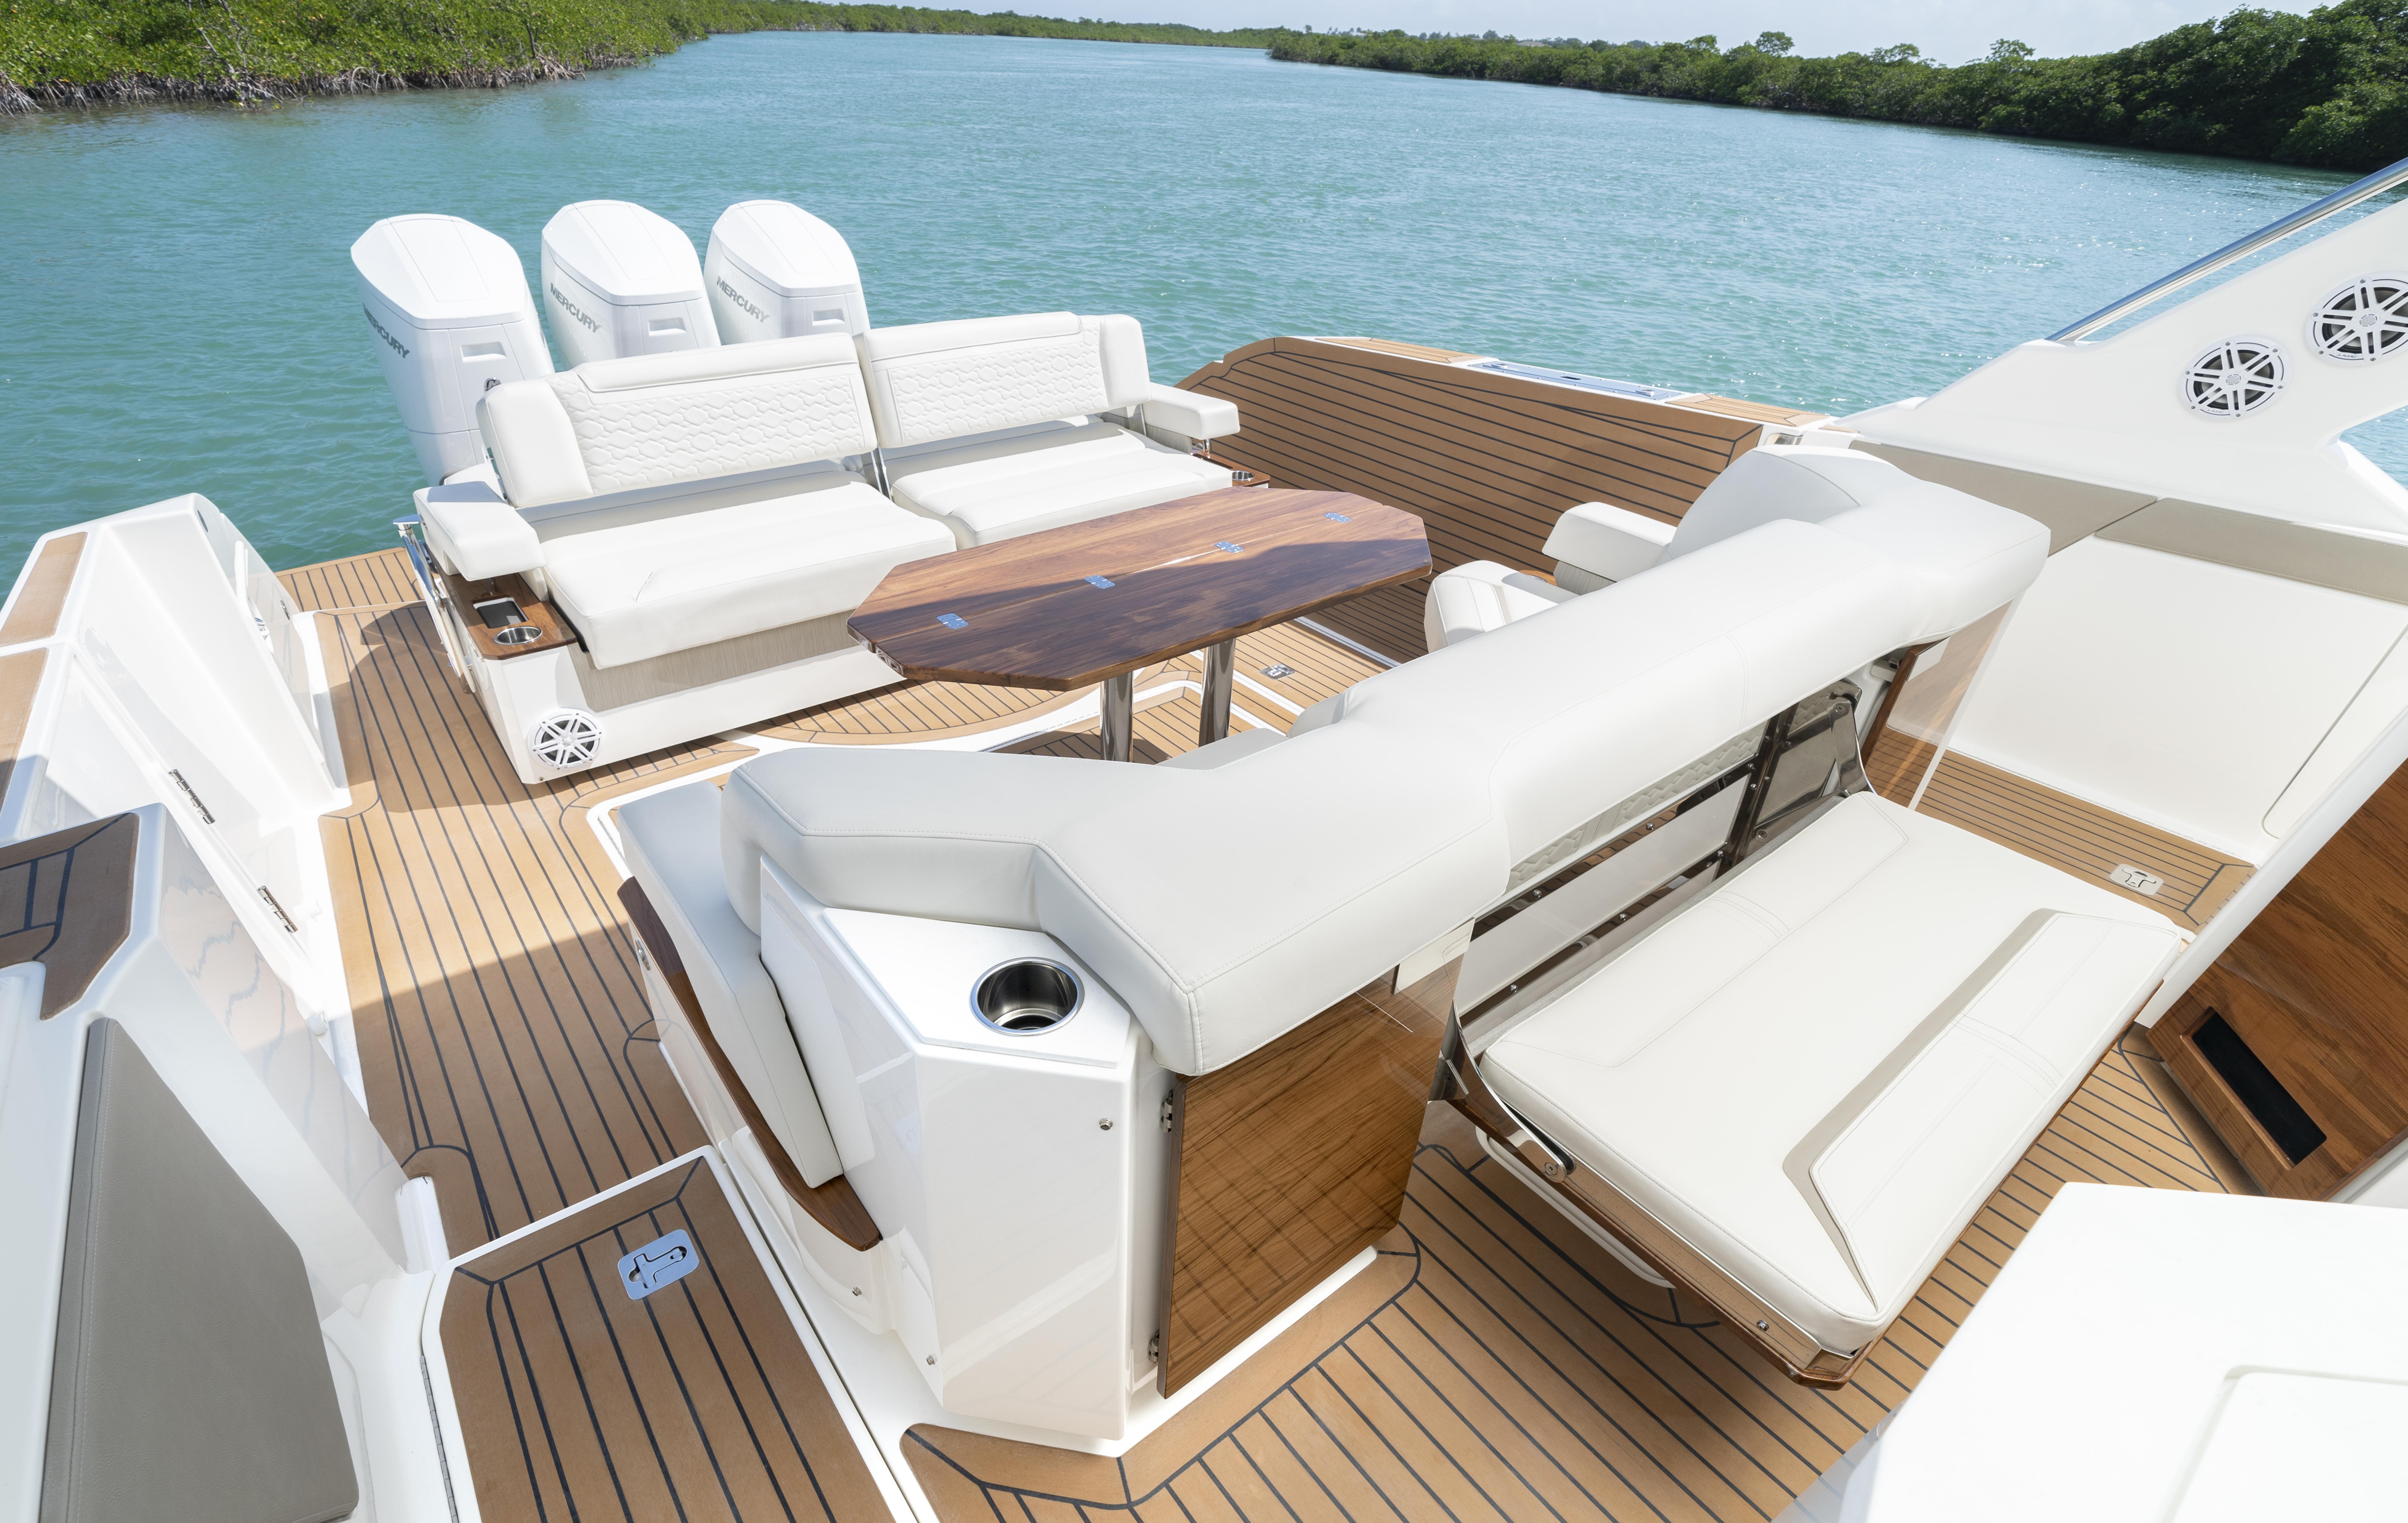 Bay Harbor Boat Show